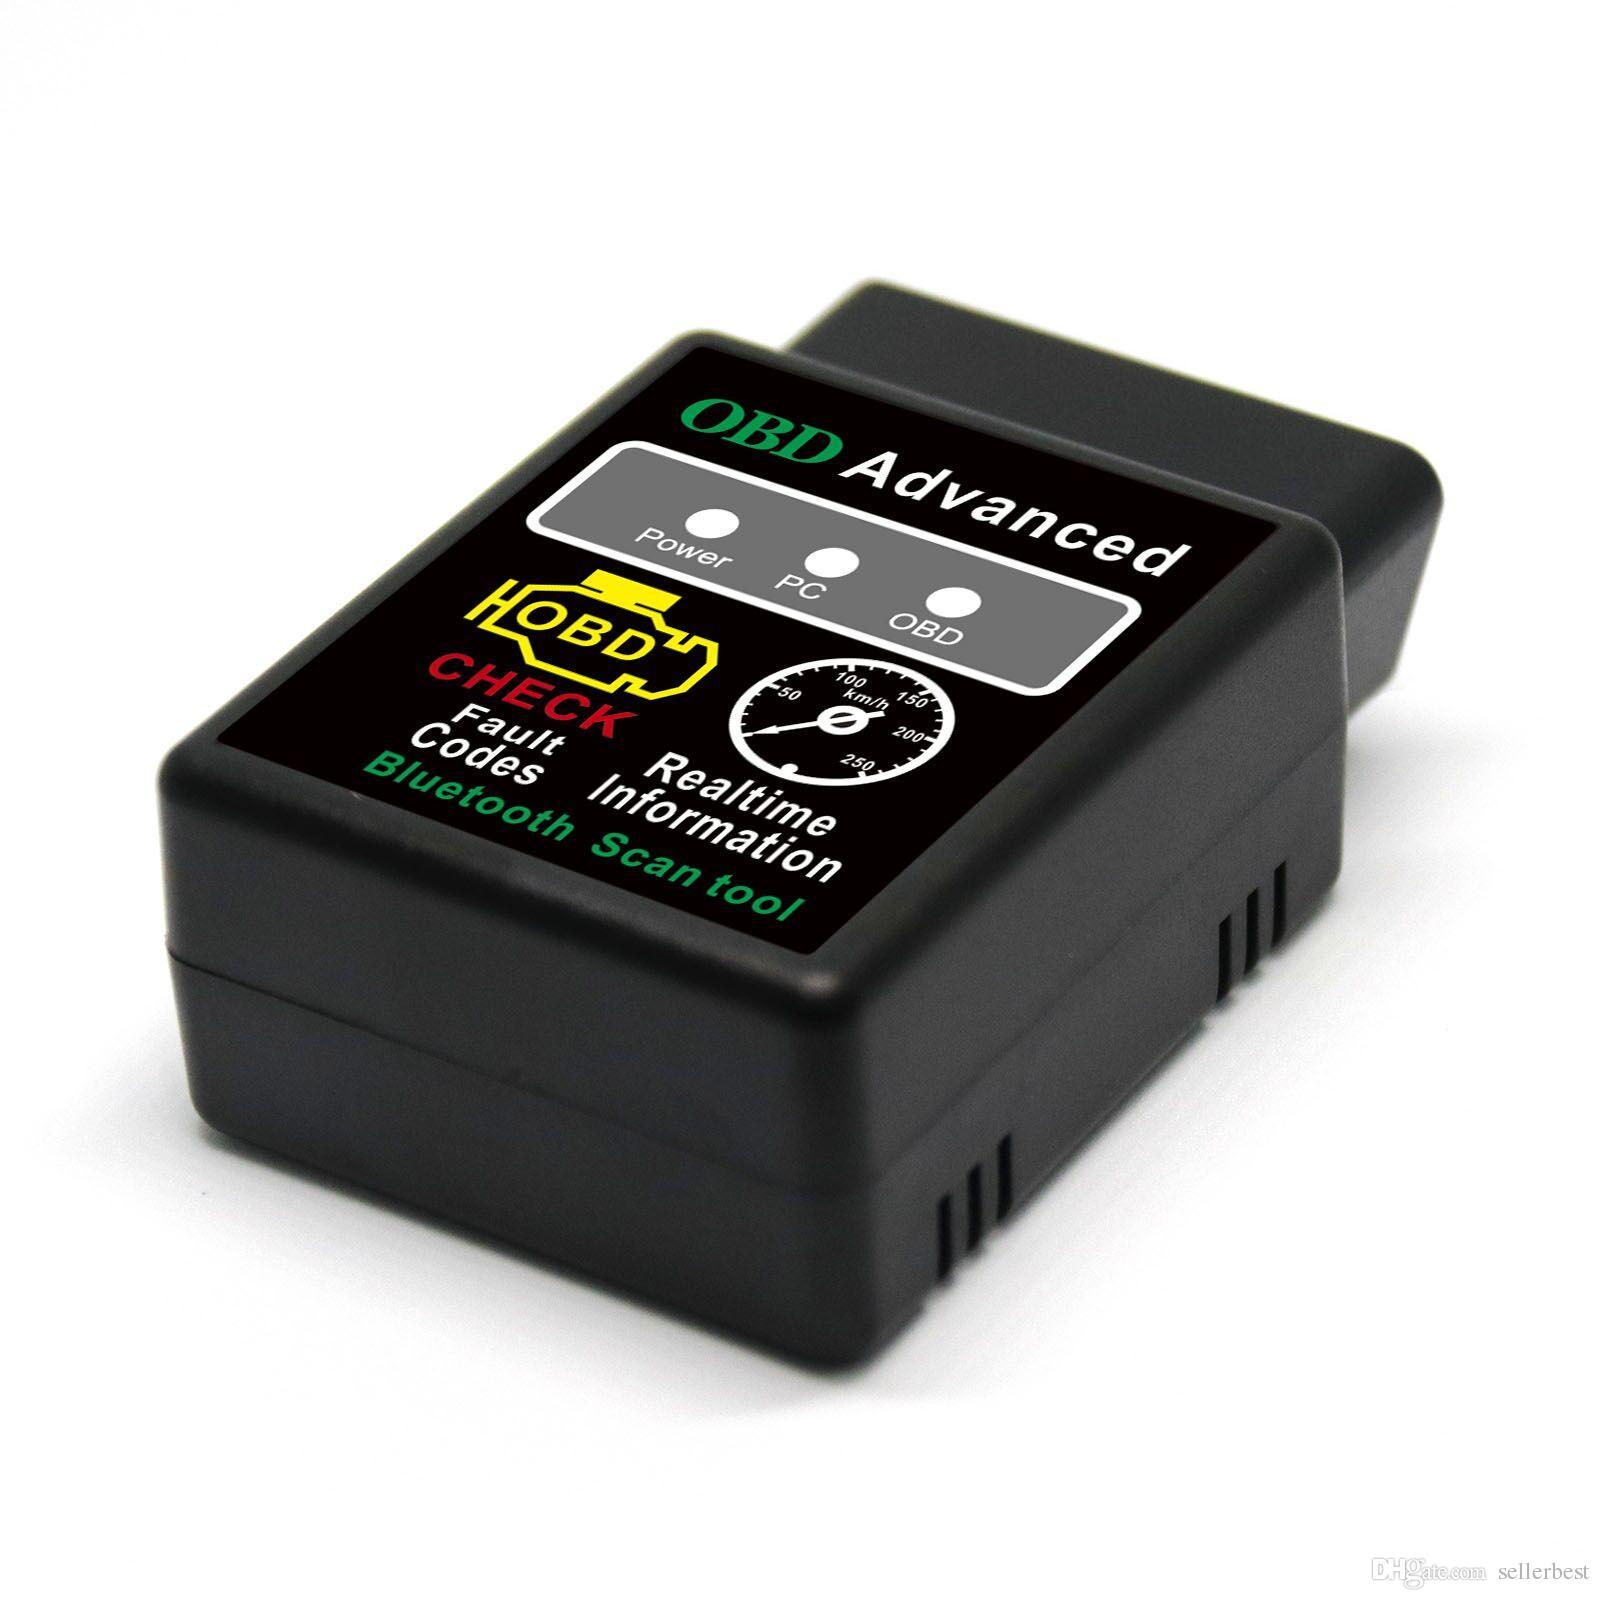 Vgate Scan Tool Quality A + V1.5 Versión 1.5 Super OBD Scan Mini Elm327 Bluetooth Elm 327 OBDII OBD2 Intercacimiento de diagnóstico automático